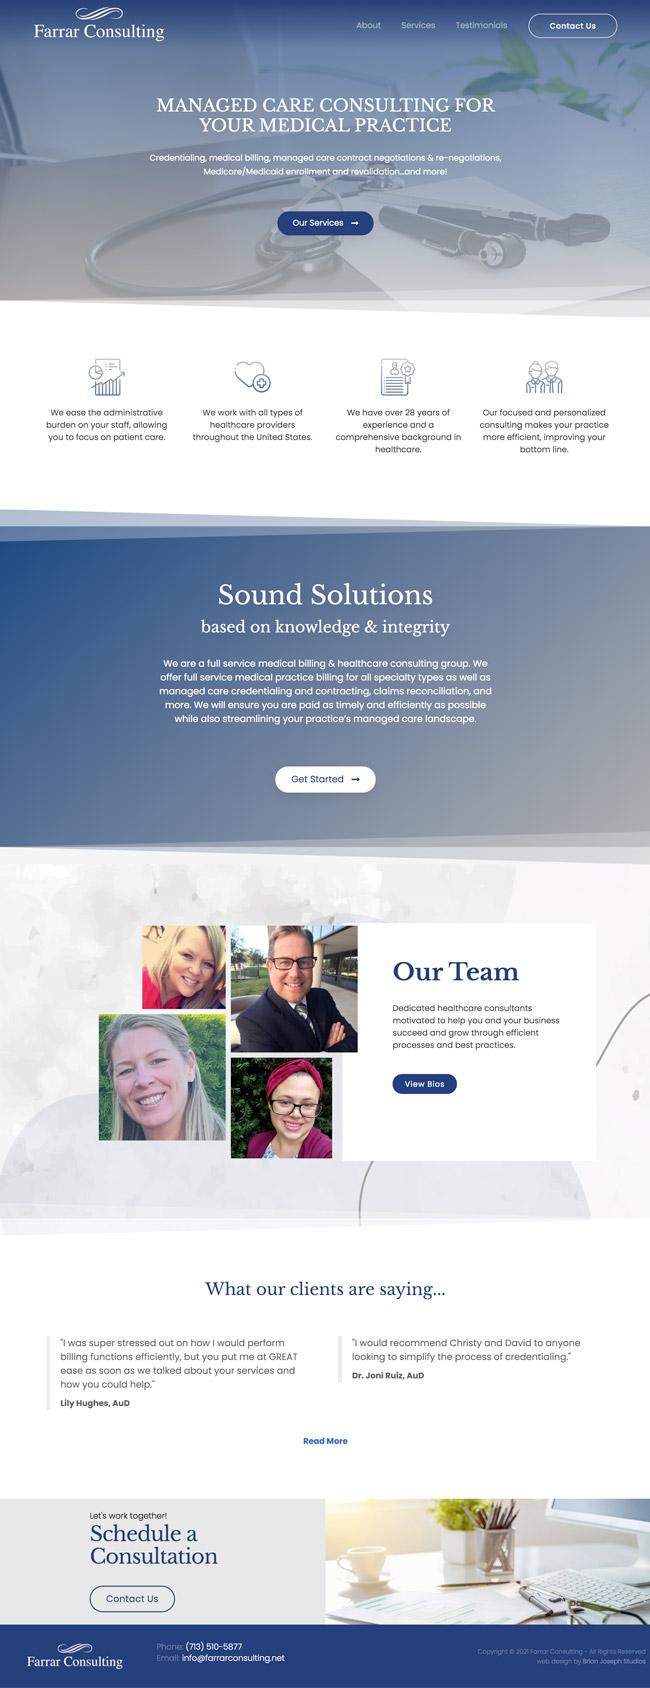 Web Design - Homepage Mockup for Farrar Consulting